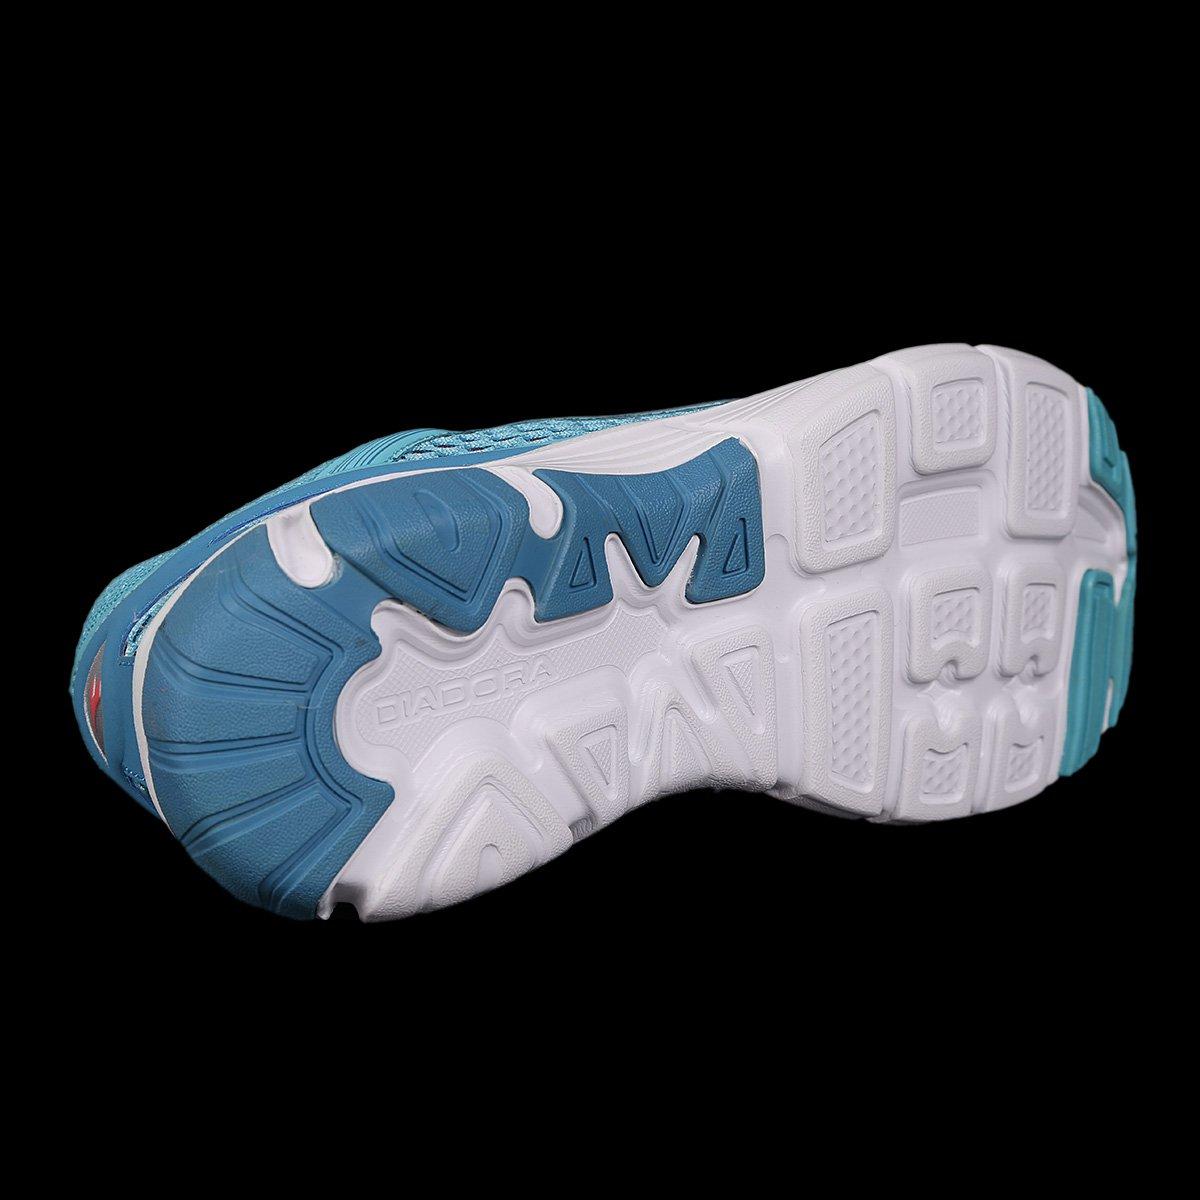 Tênis Diadora Easy Run 2 Feminino - Azul - Compre Agora  33d585814c4f1